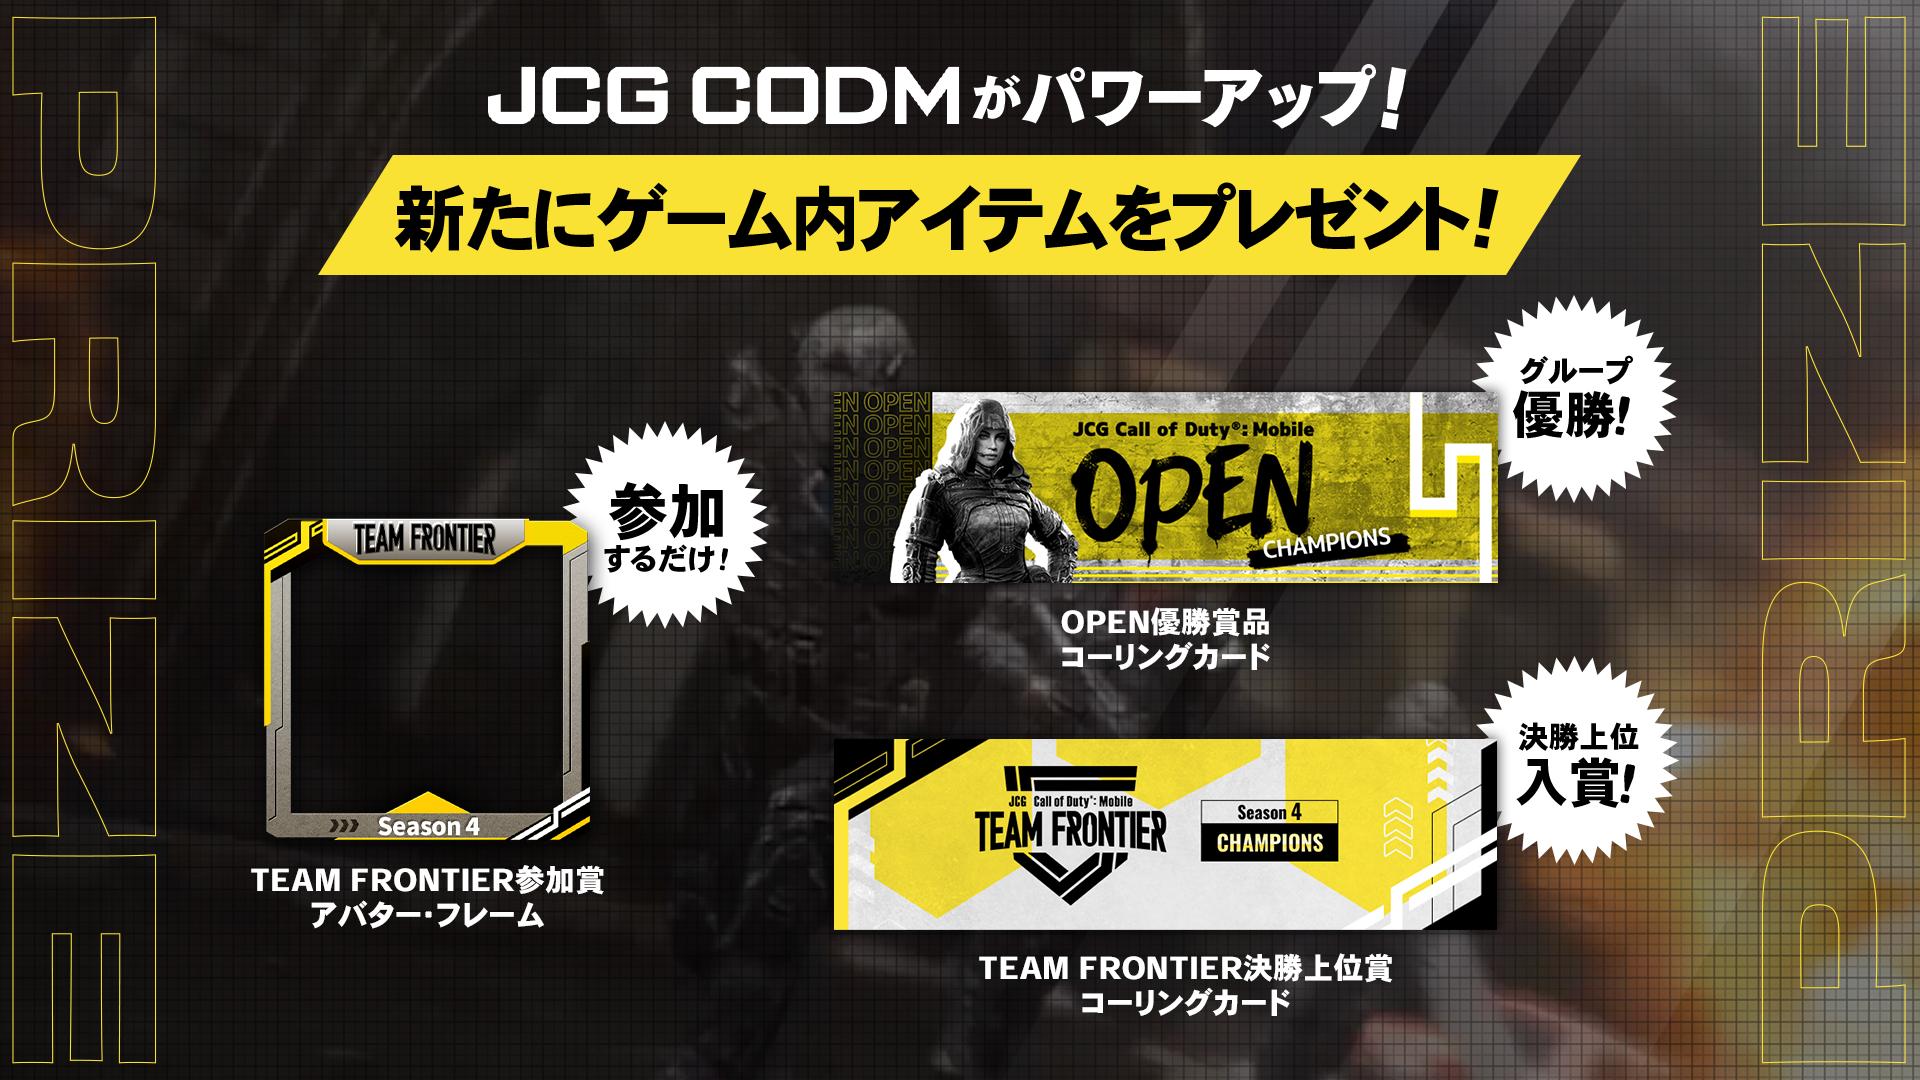 JCG_CODM_JCGCODMがパワーアップ (2).png